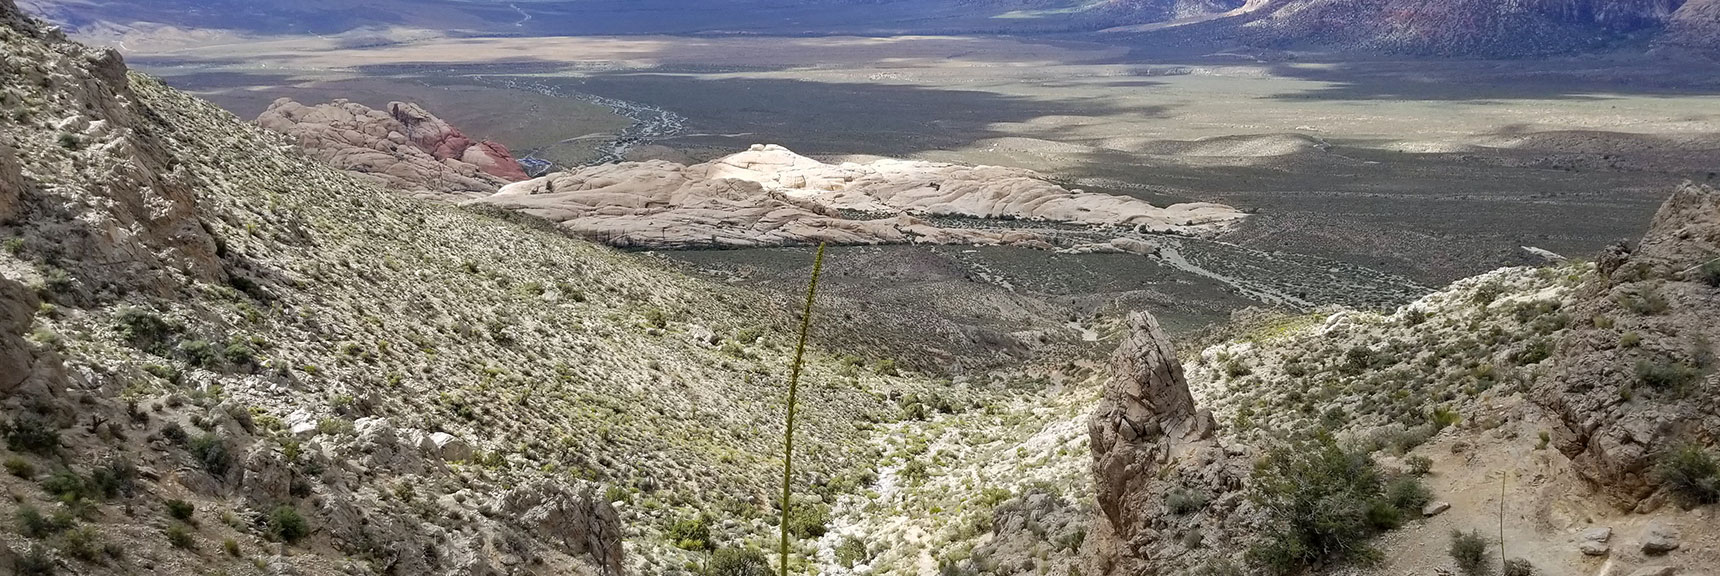 Heading Down Main Turtlehead Peak Trail in Red Rock National Park, Nevada